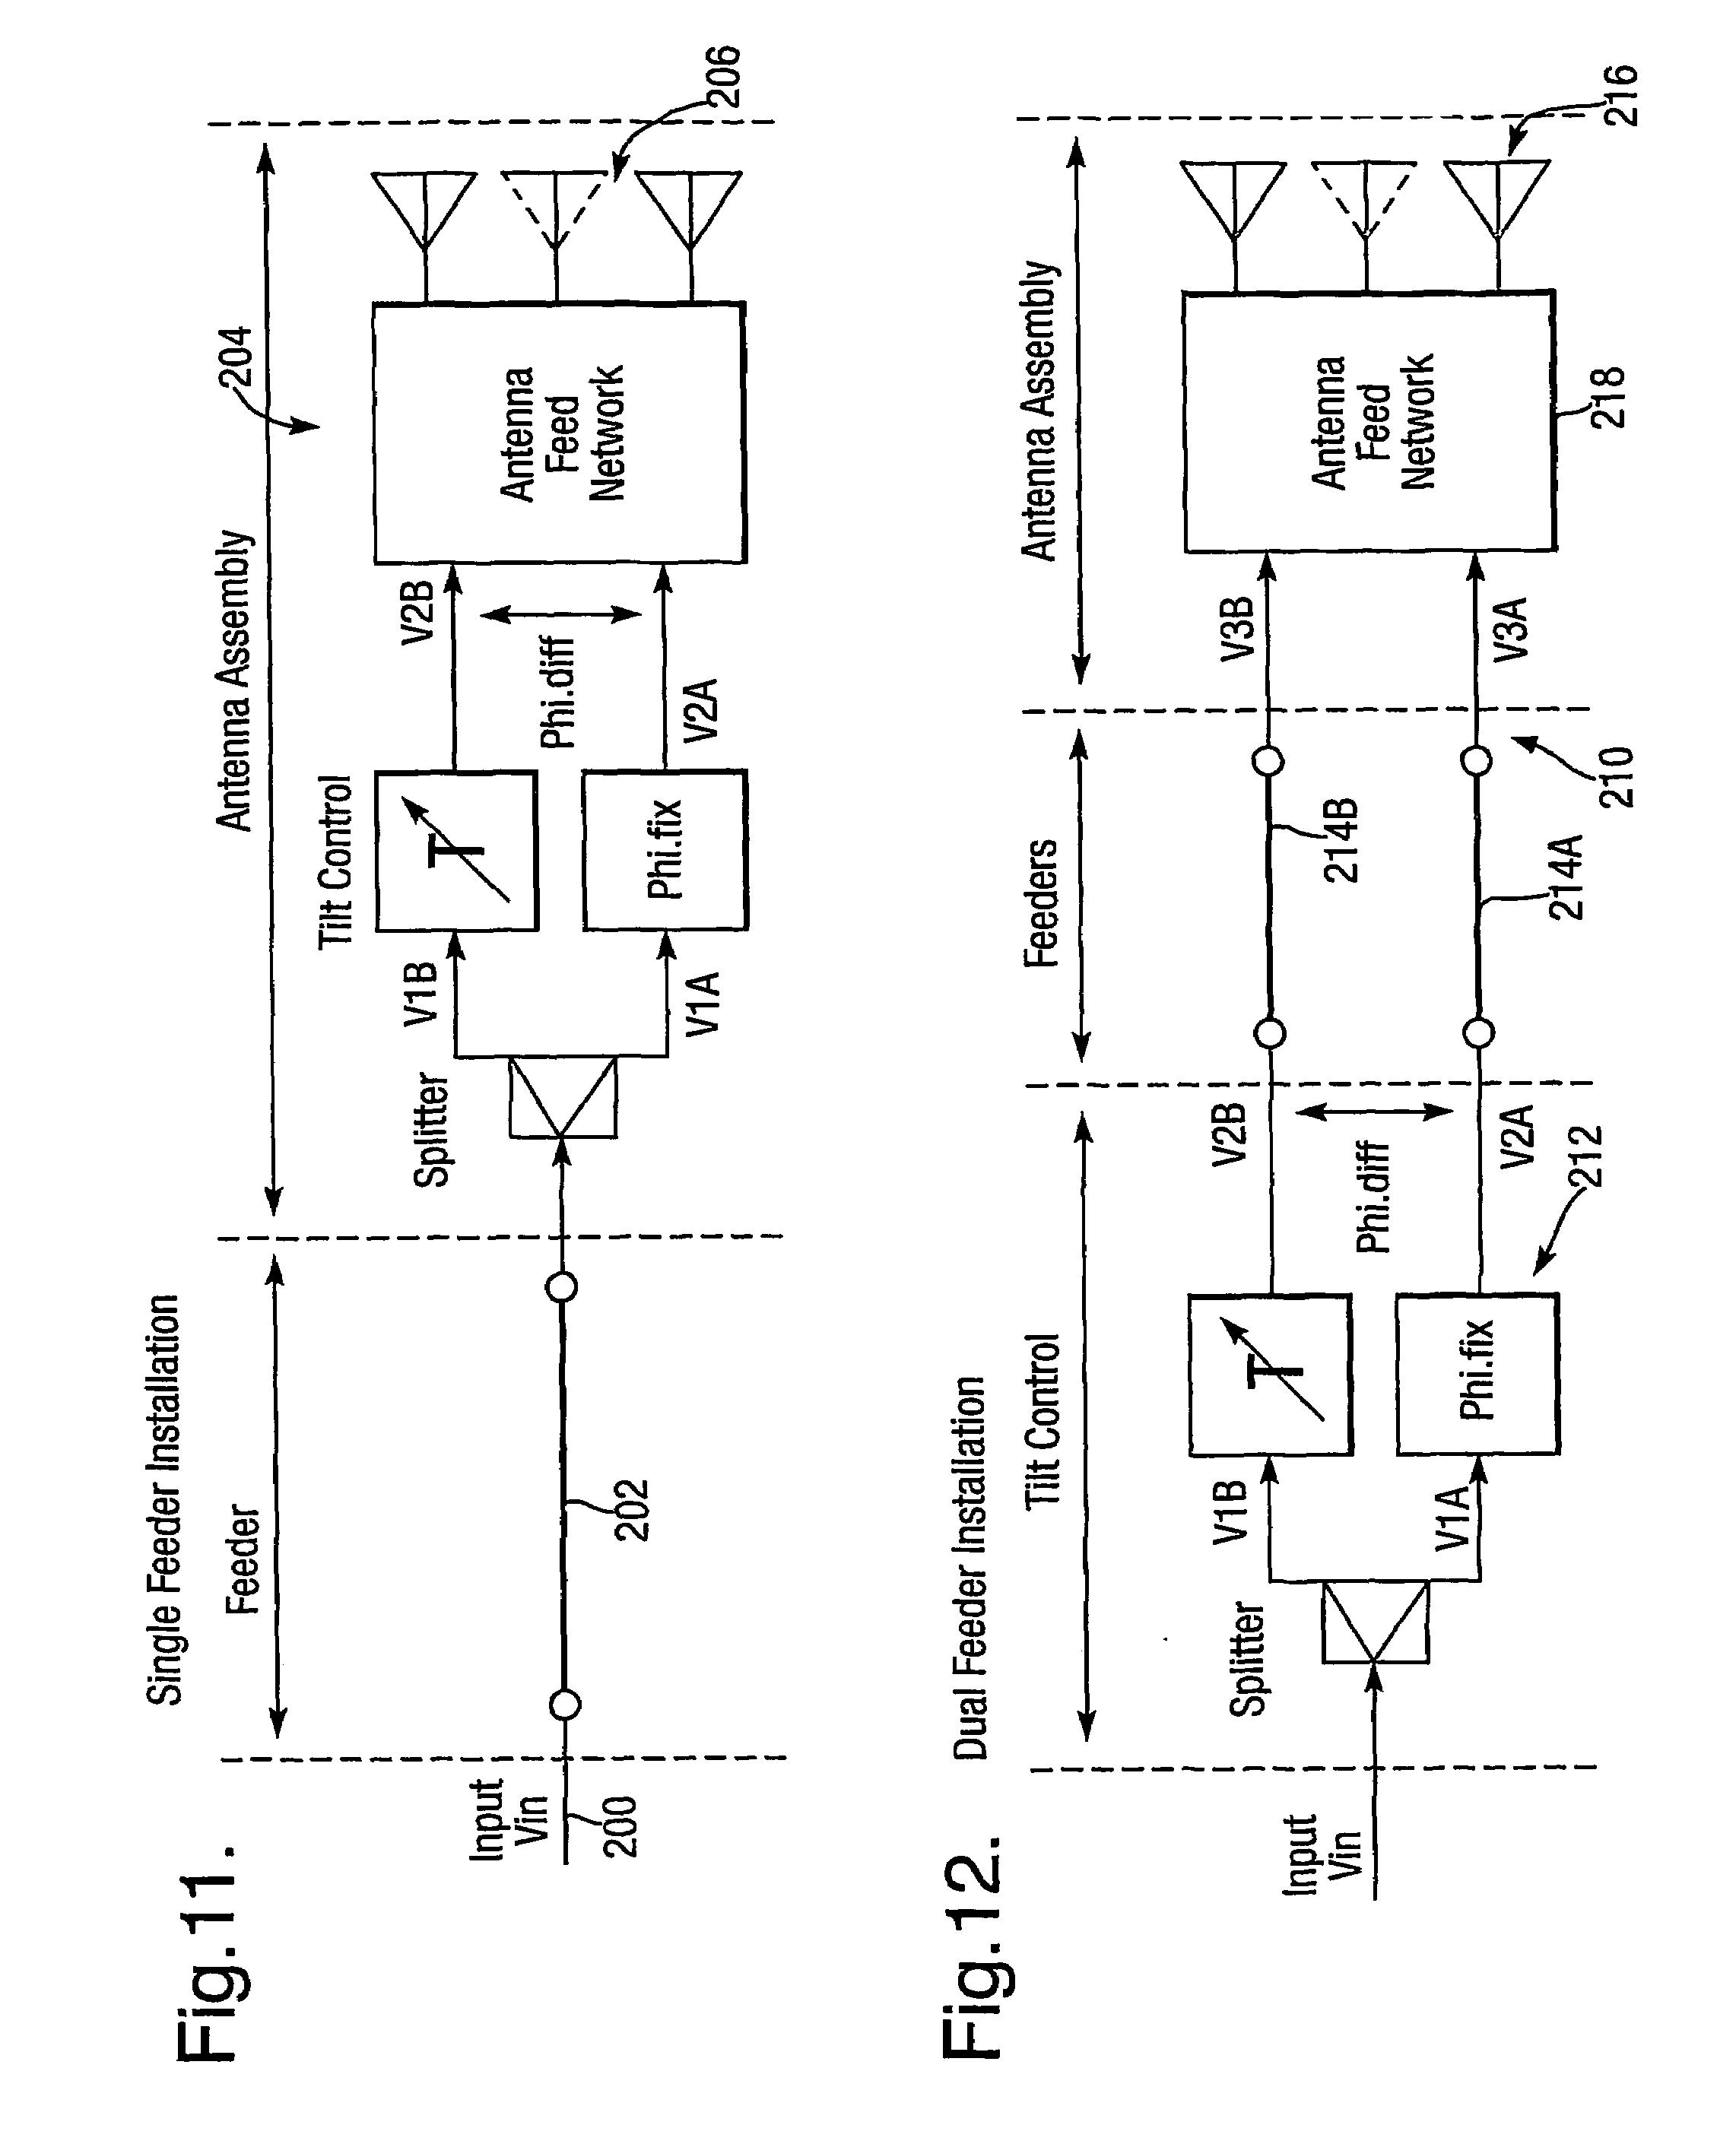 Patent US 7,450,066 B2